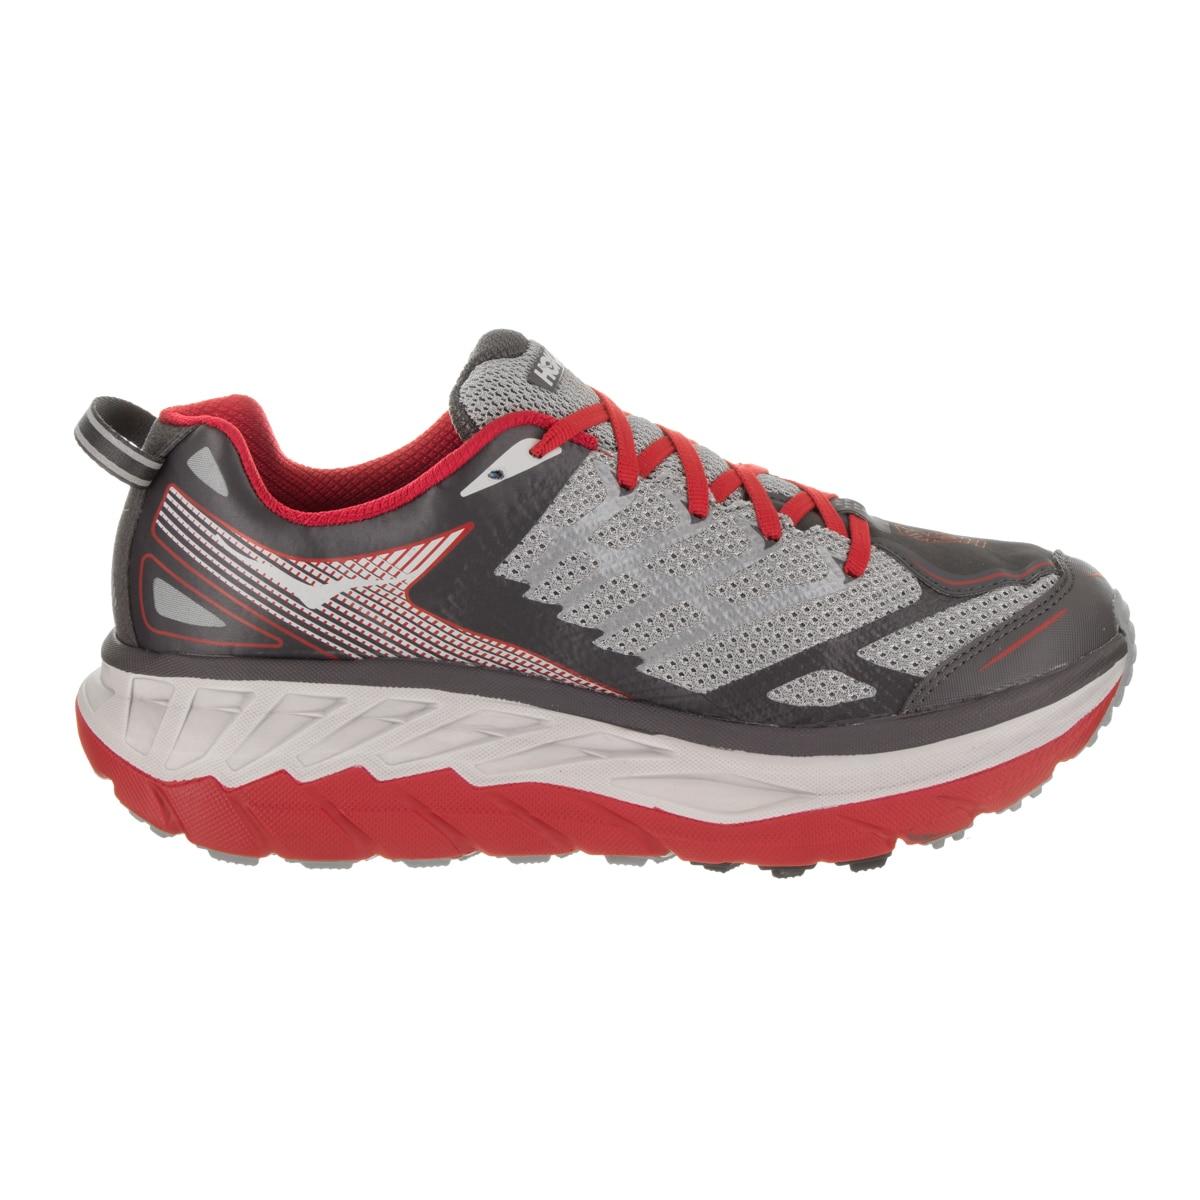 5b50977eae60 Shop Hoka One One Men s Stinson ATR 4 Red Grey Running Shoe - Free Shipping  Today - Overstock.com - 16839234